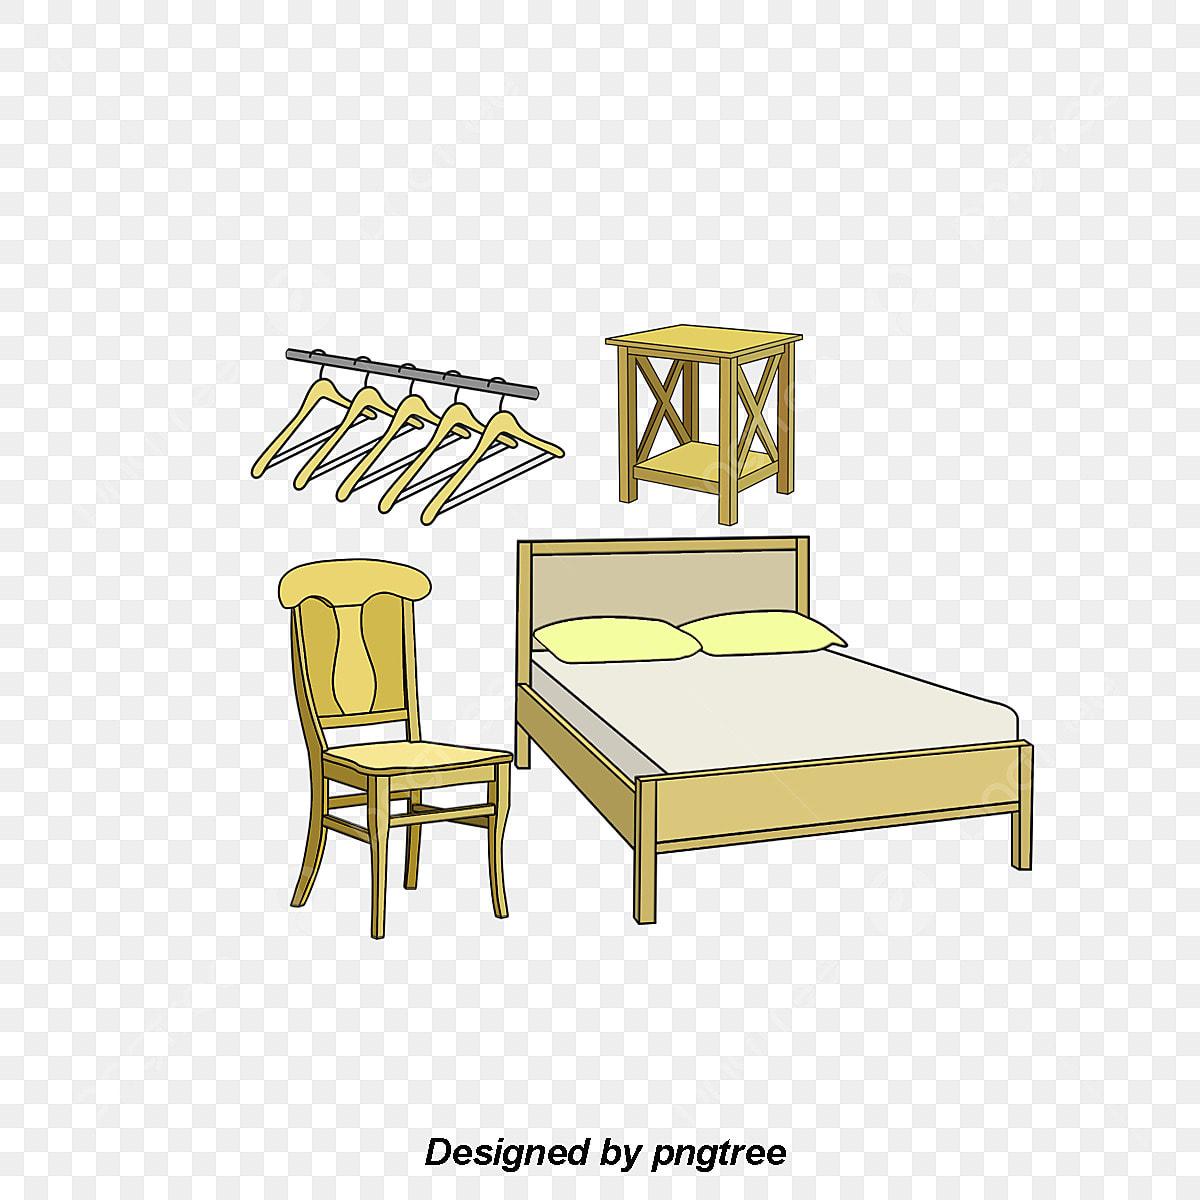 Terrific Wooden Fresh Style Edge Illustration Element Furniture Chair Interior Design Ideas Helimdqseriescom